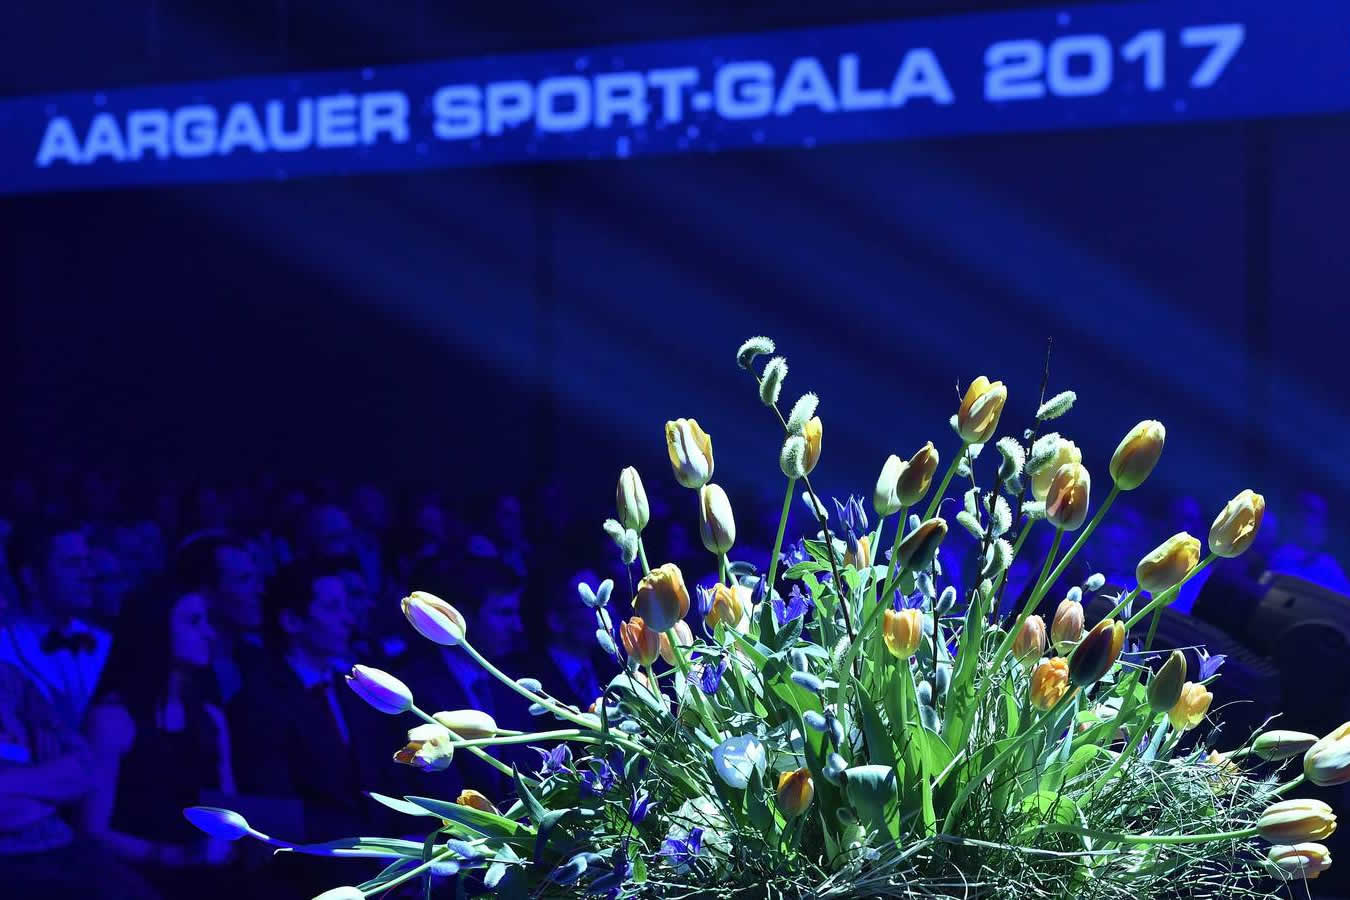 Aargauer Sportgala 2017